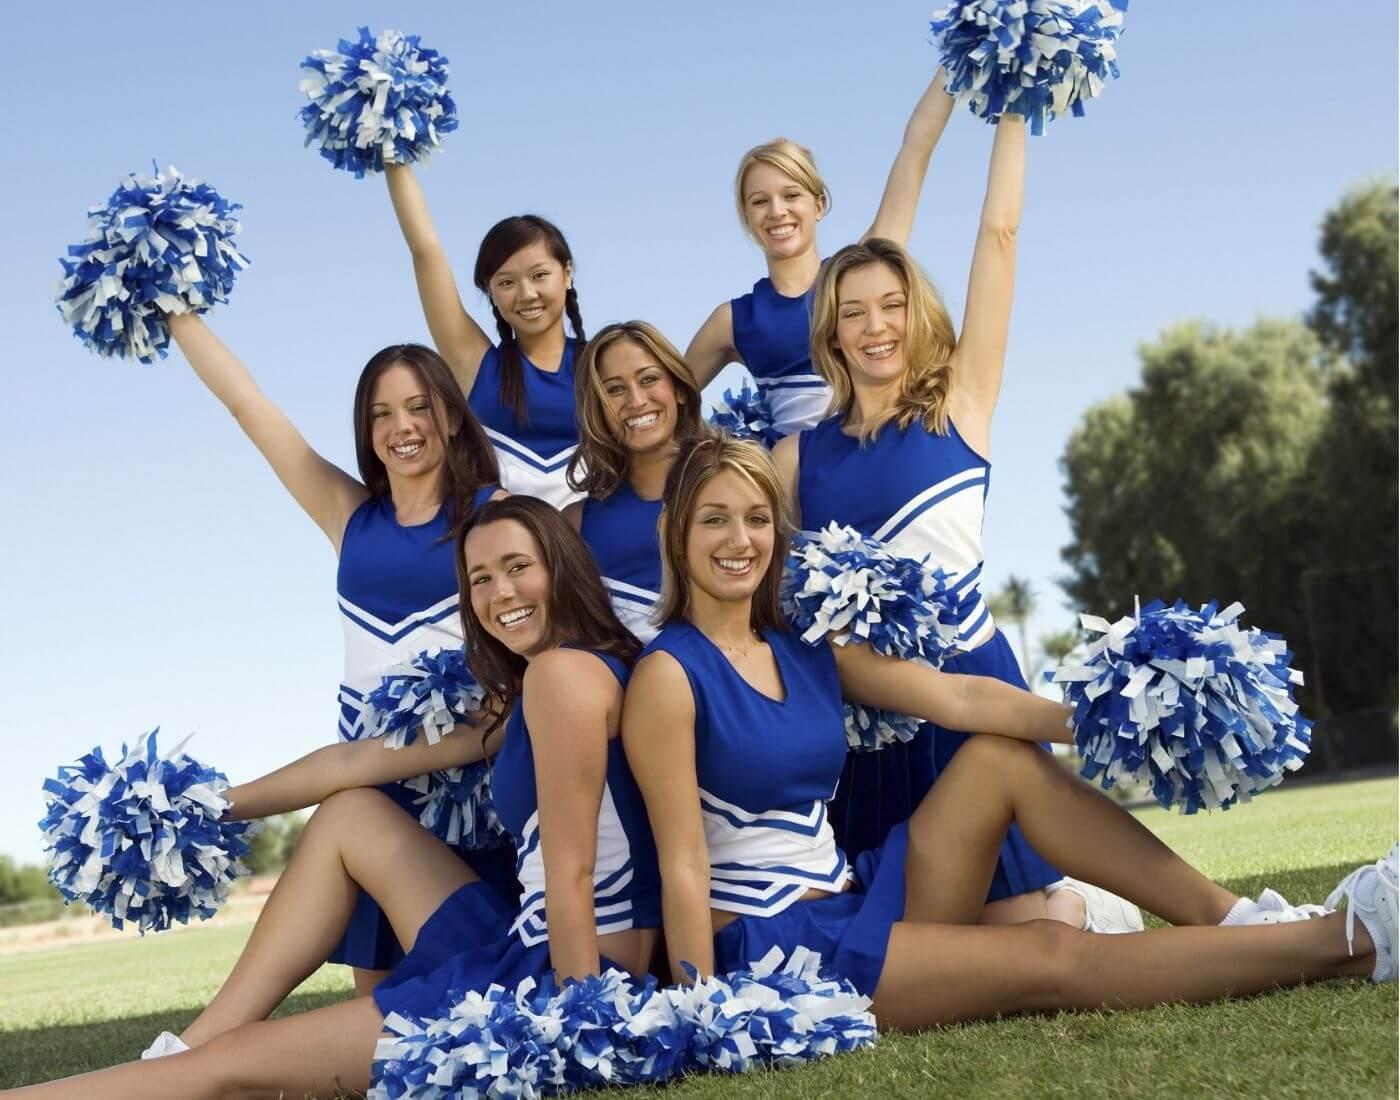 Cheerleading sports